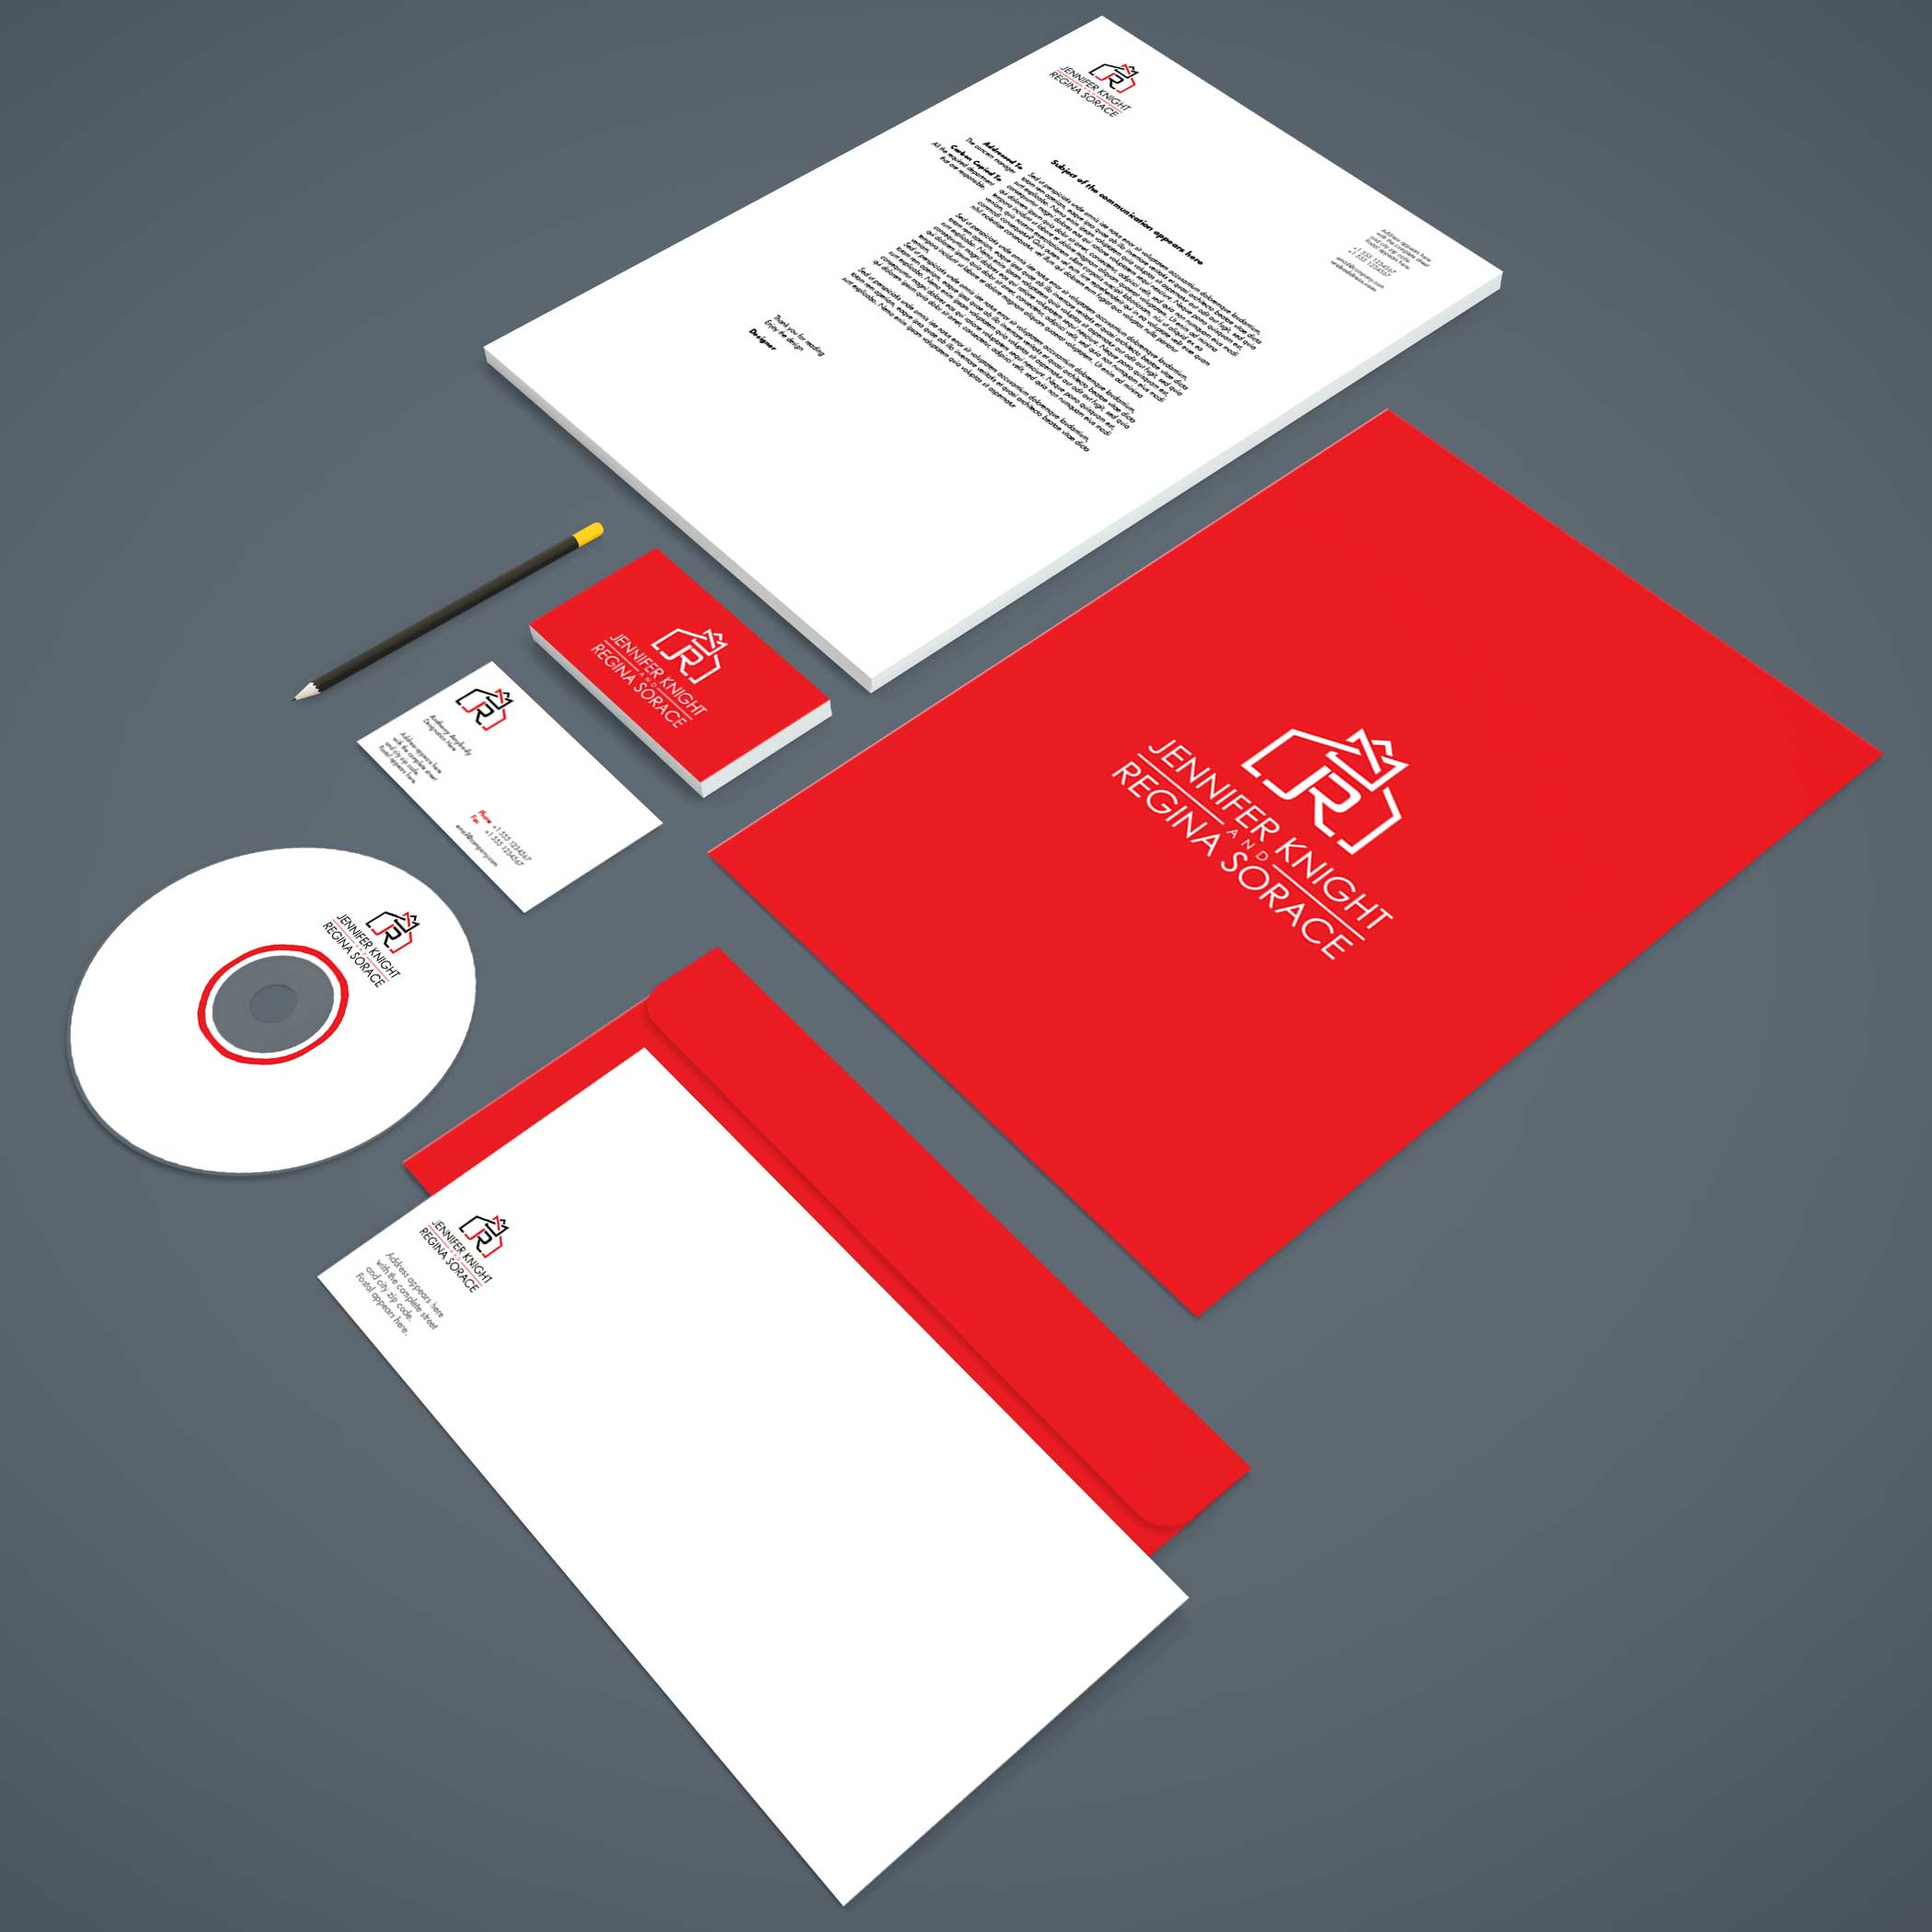 logo design service for Jennifer Knight &  Regina Sorace